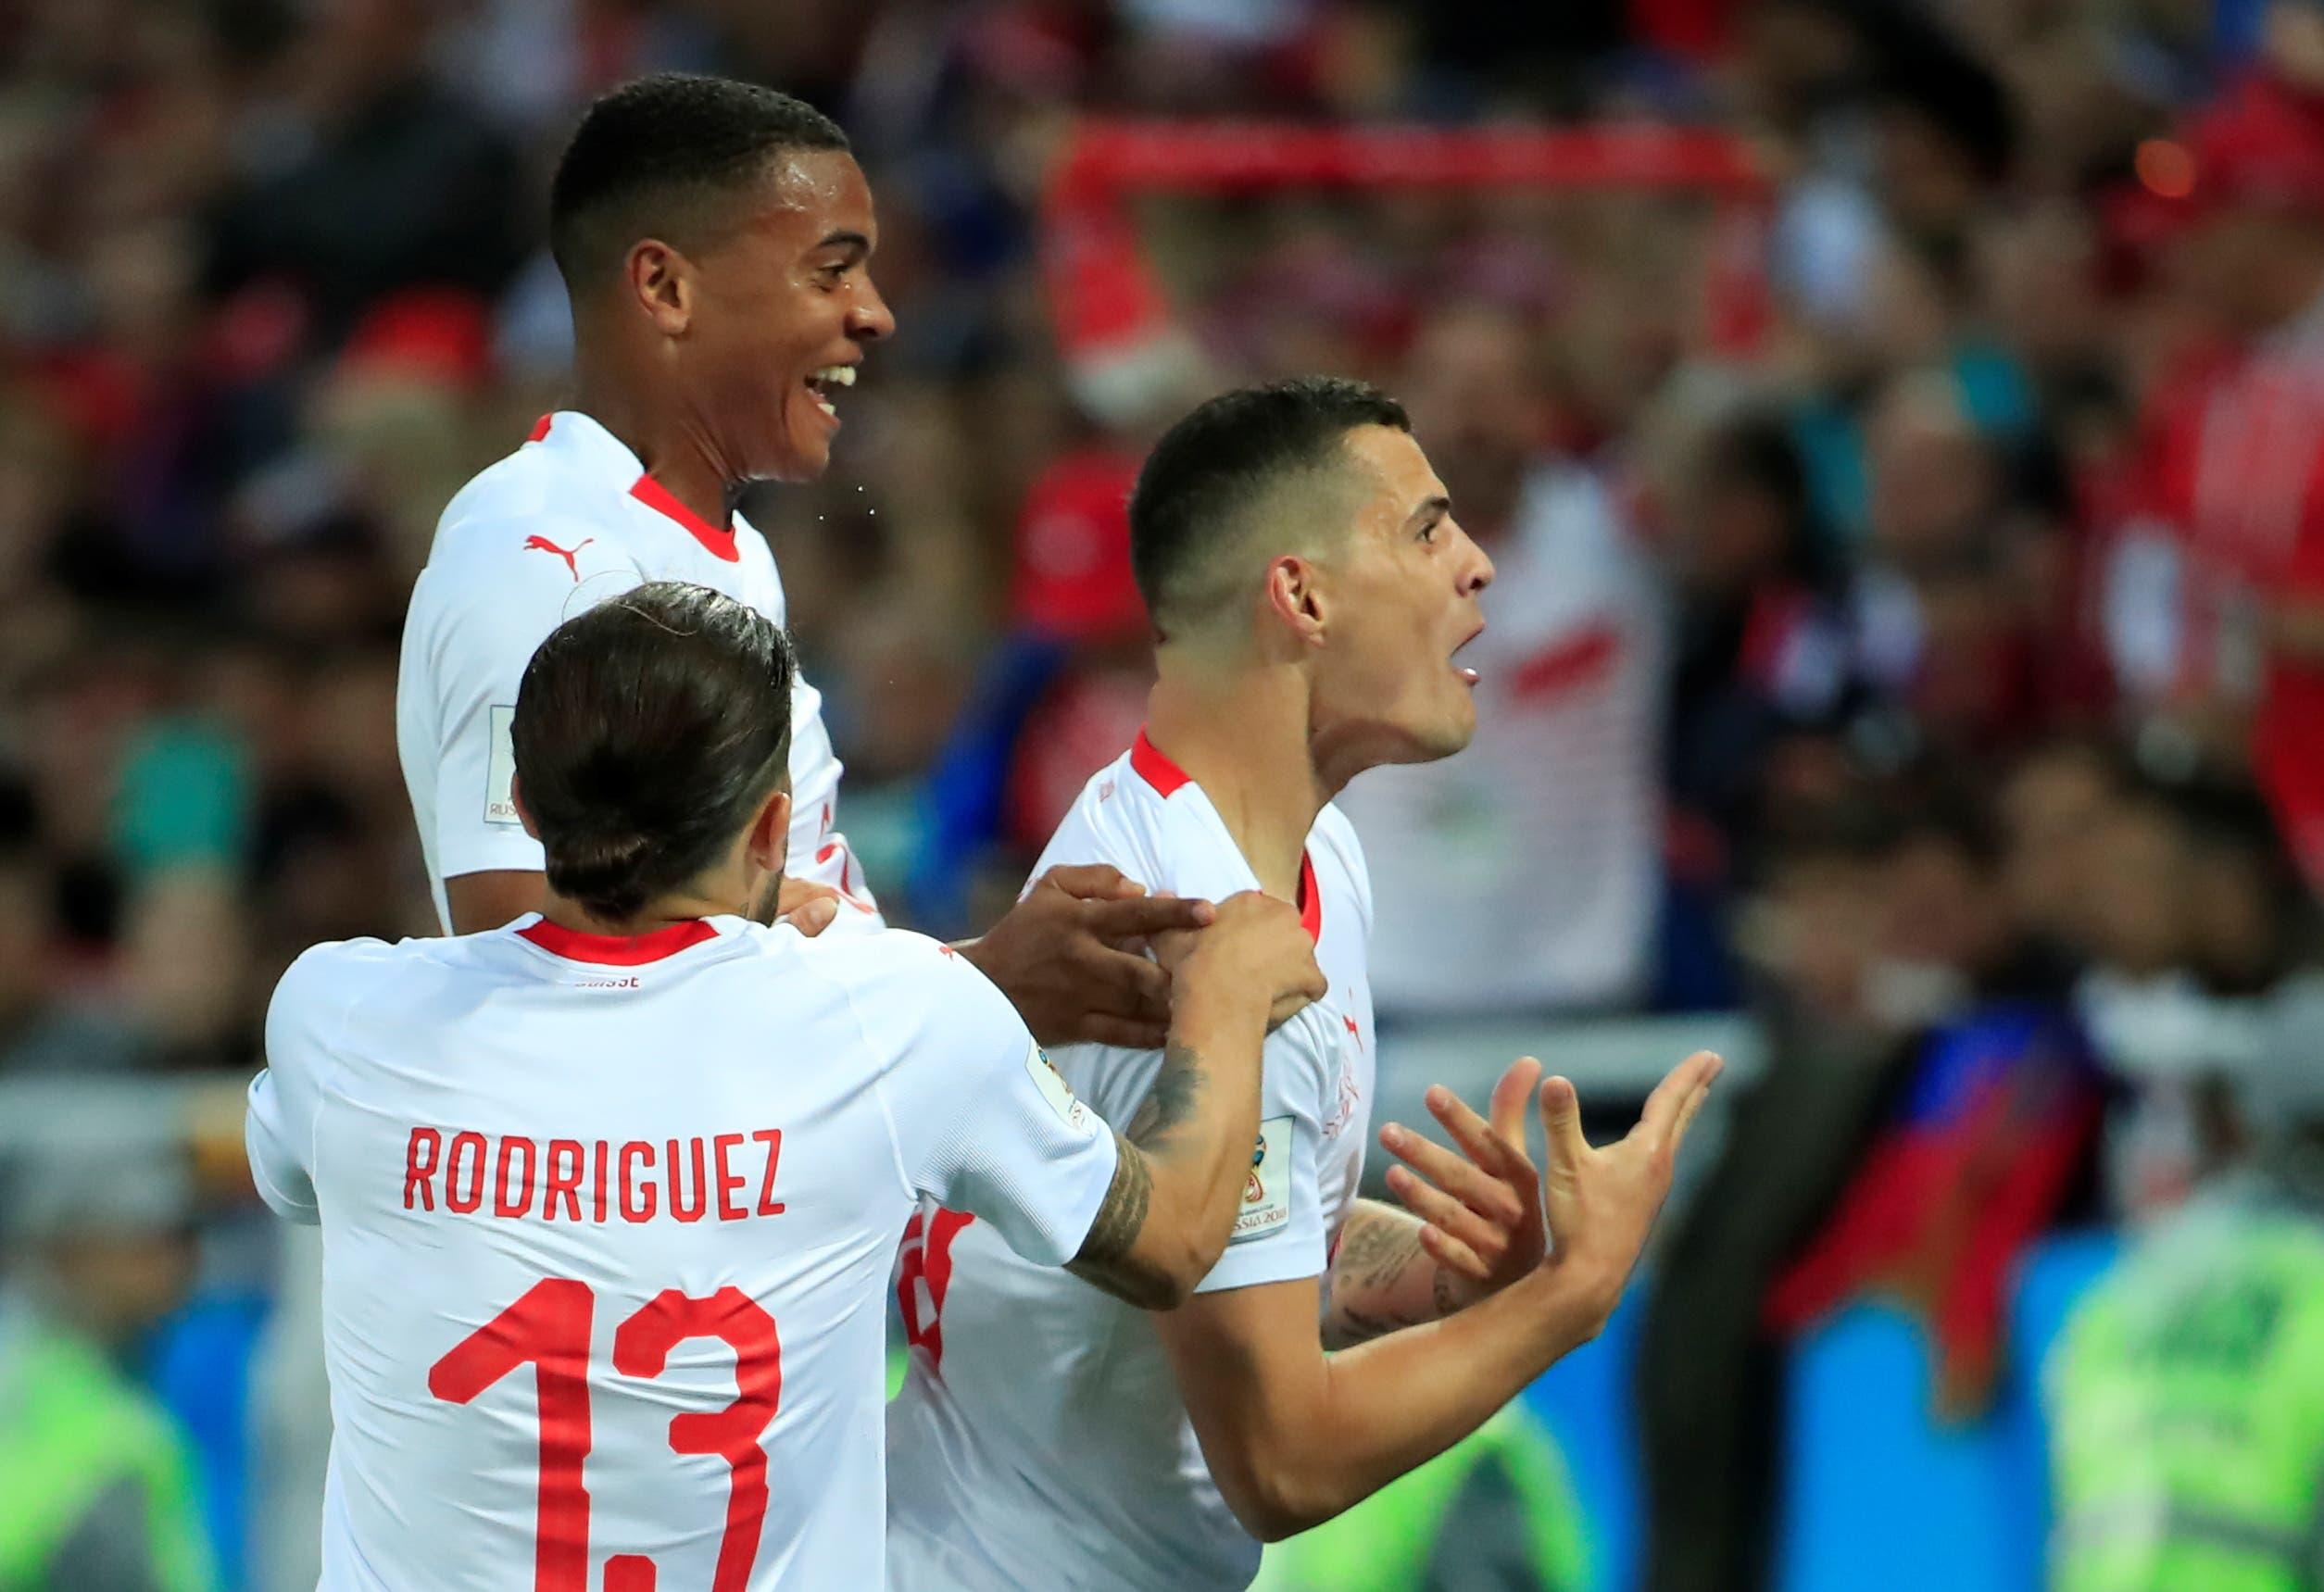 Granit Xhaka celebrates his goal against South Korea in their 2-1 win. (Reuters)